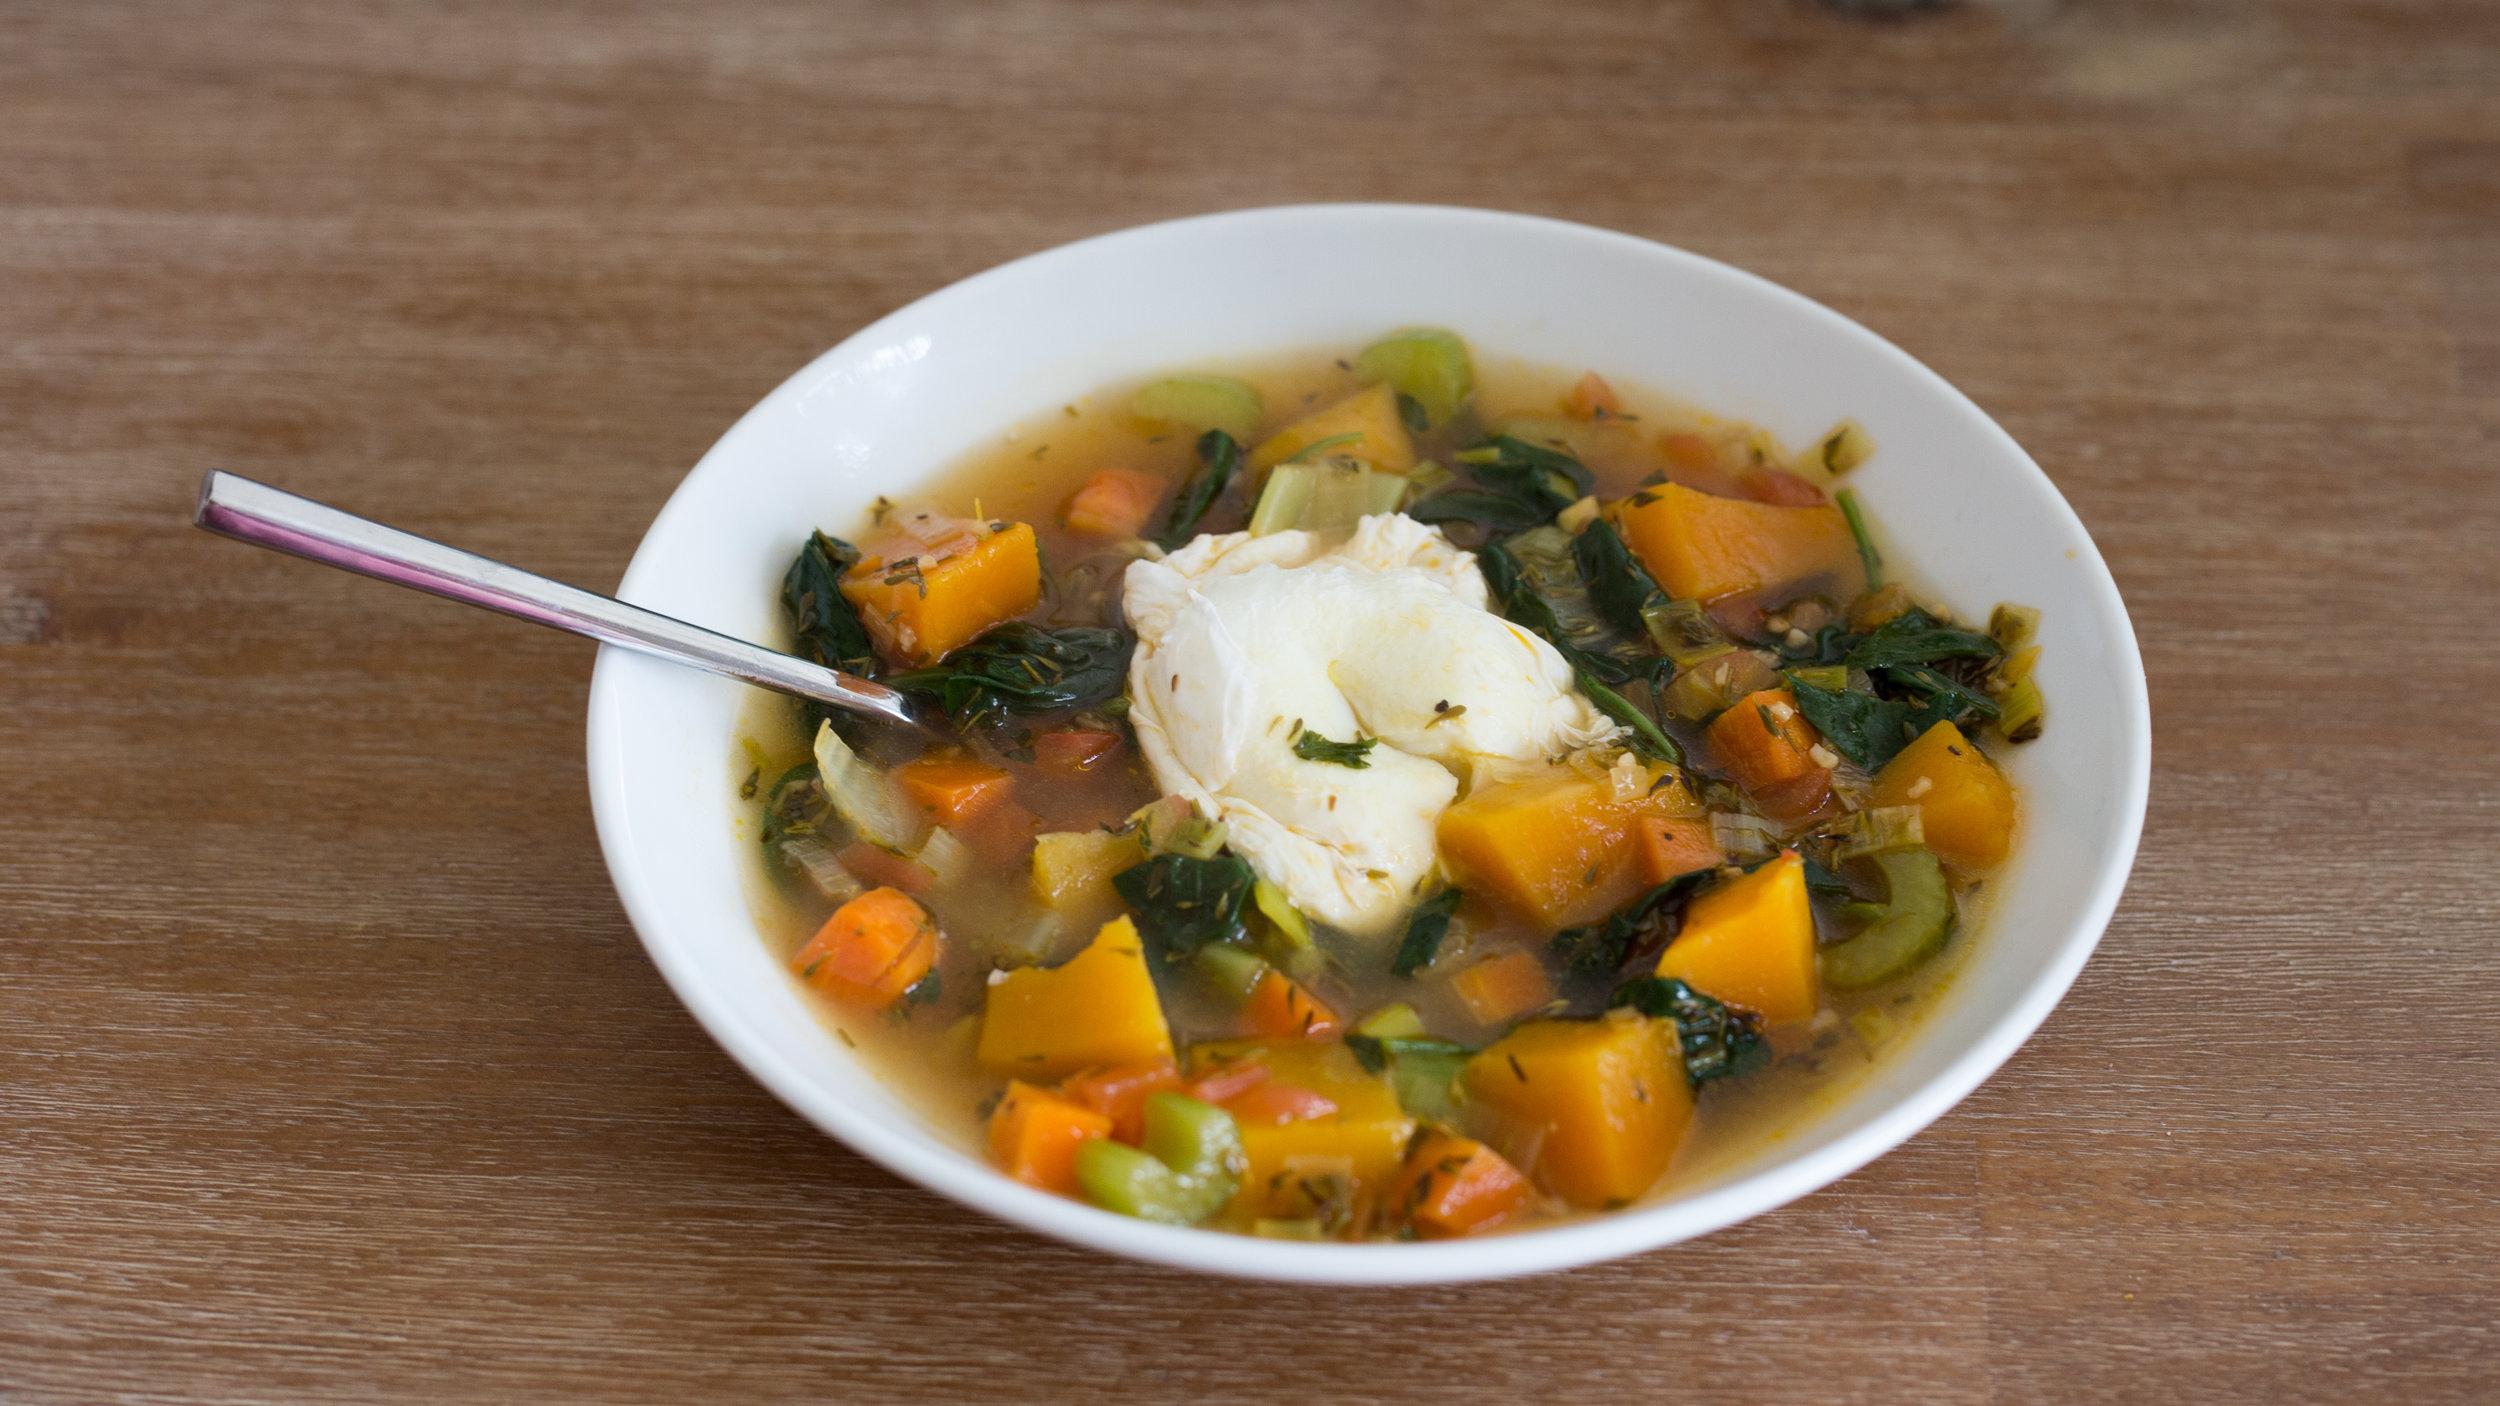 Veggie Harvest Soup Final Plated-1.jpg